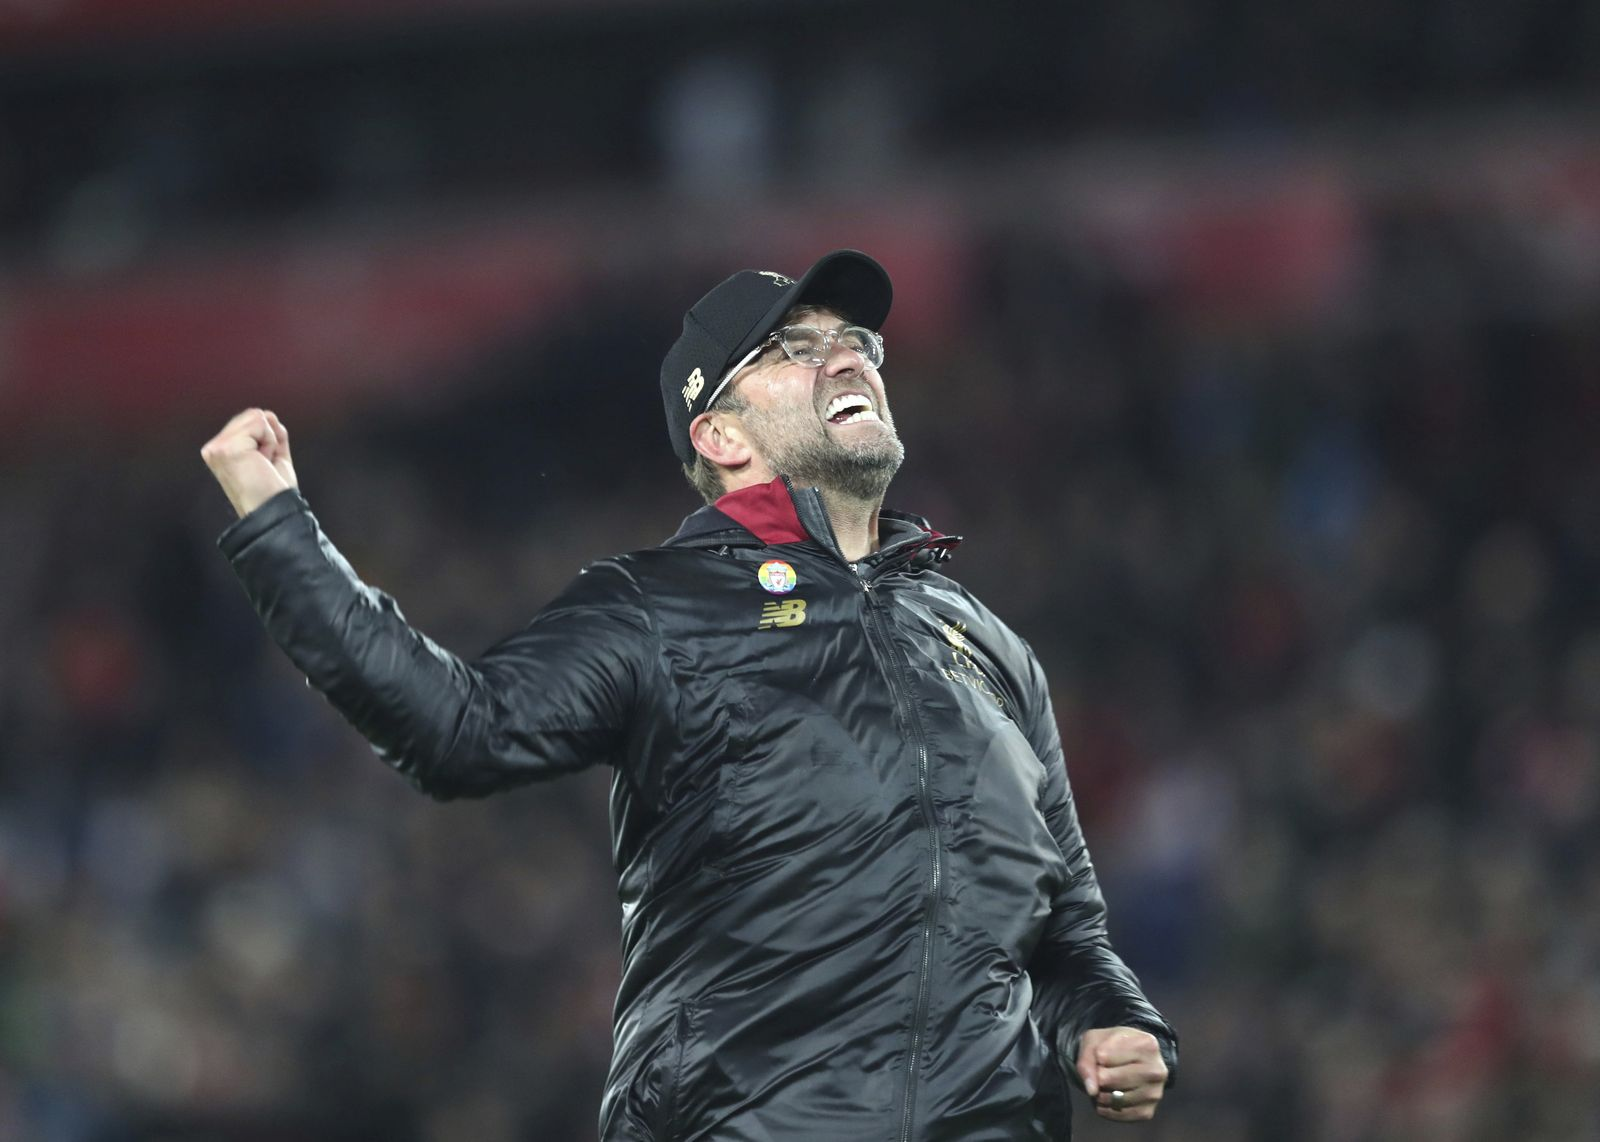 FC Liverpool - FC Everton klopp